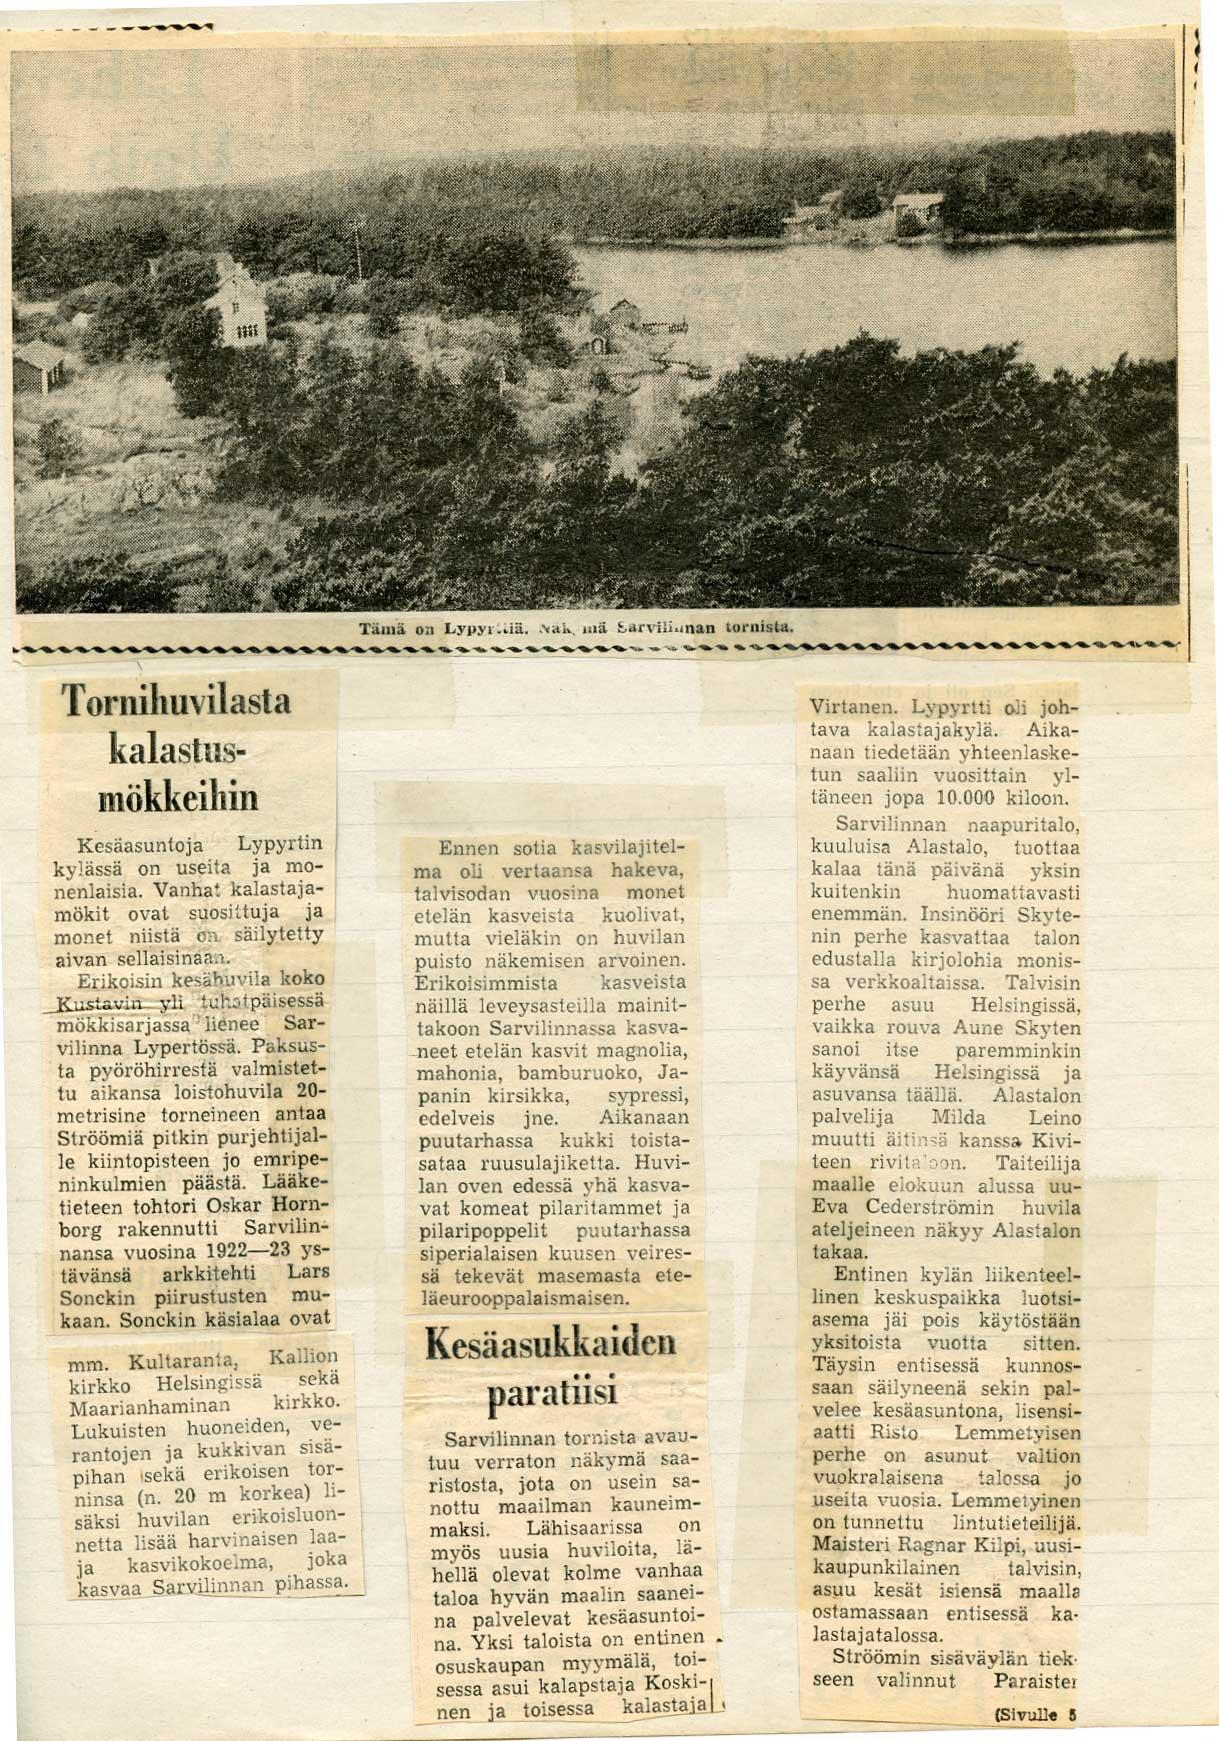 Uudenkaupungin Sanomat 1.8.1973 s. 3